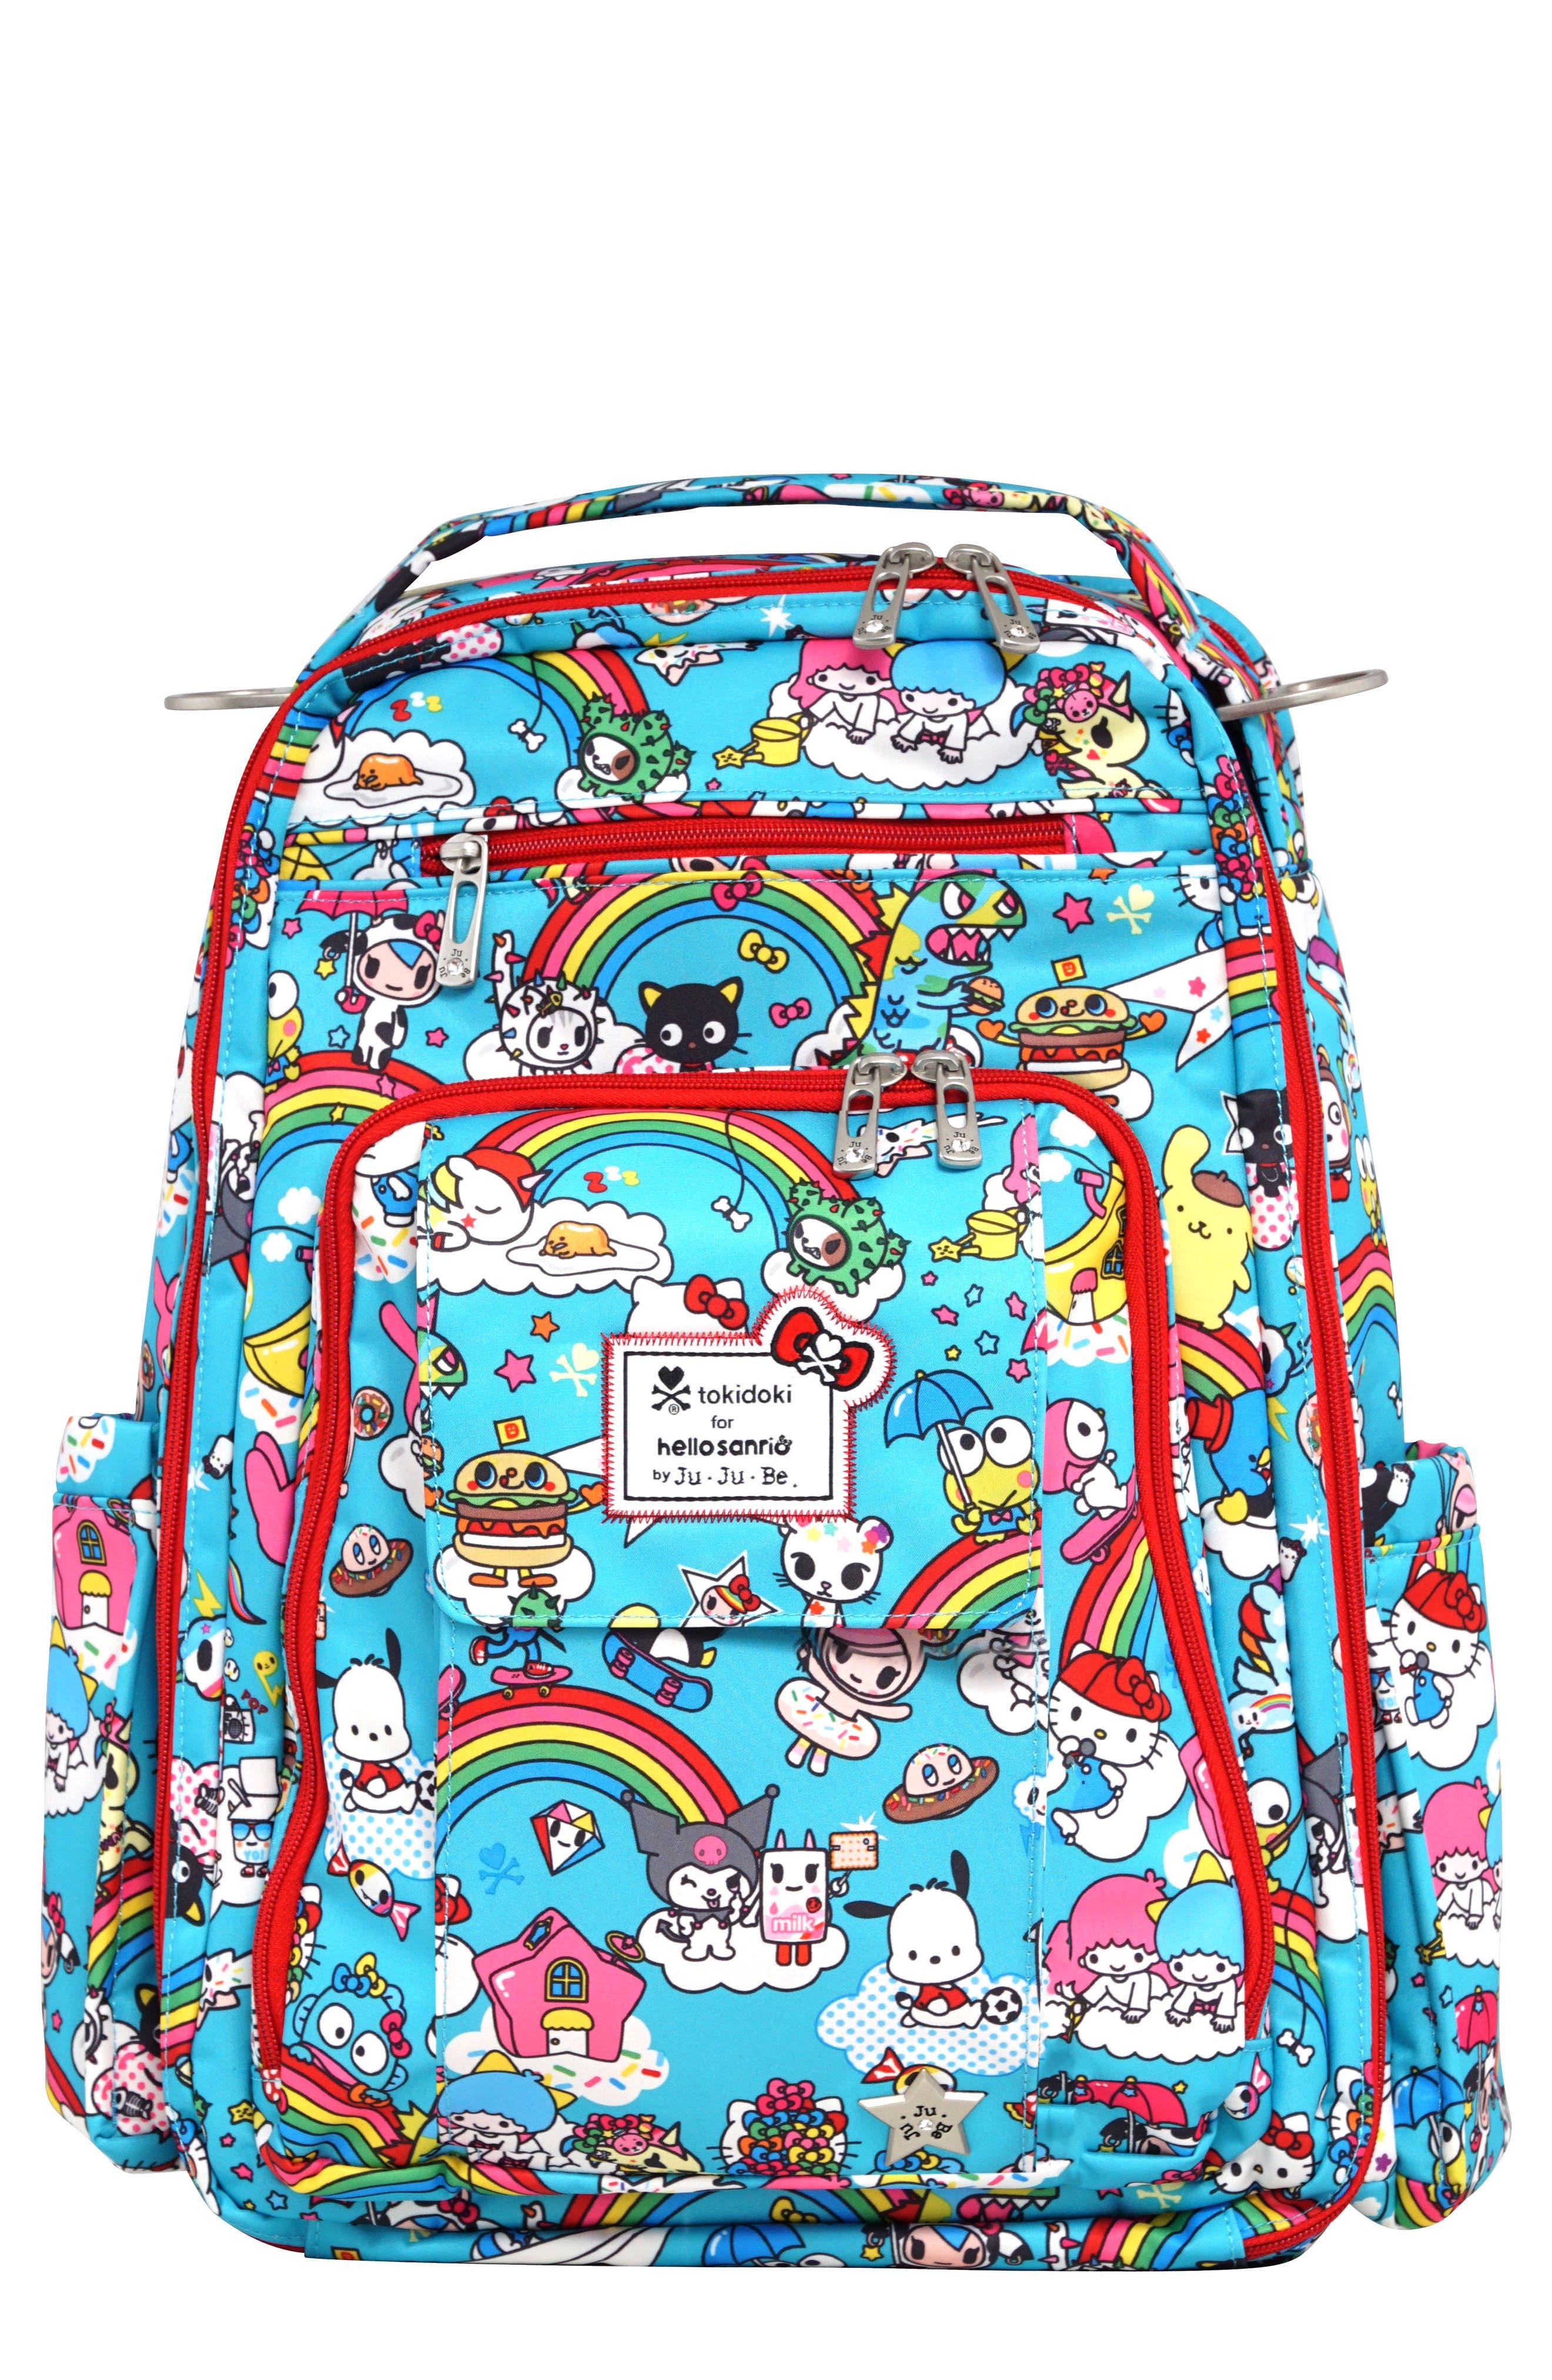 x tokidoki for Hello Sanrio Rainbow Dreams Be Right Back Diaper Backpack,                             Main thumbnail 1, color,                             433